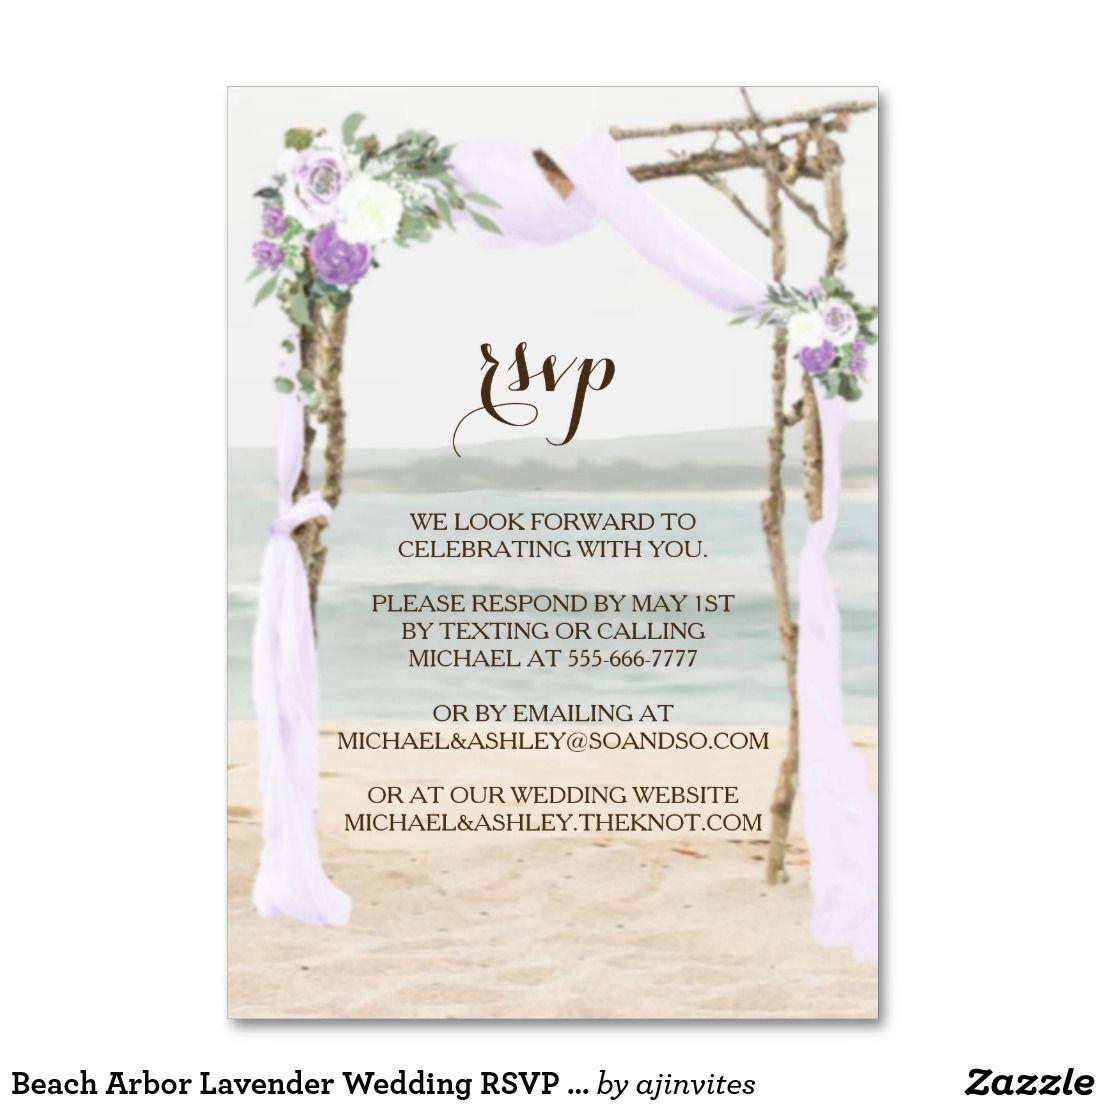 Beach arbor lavender wedding rsvp card no envelope